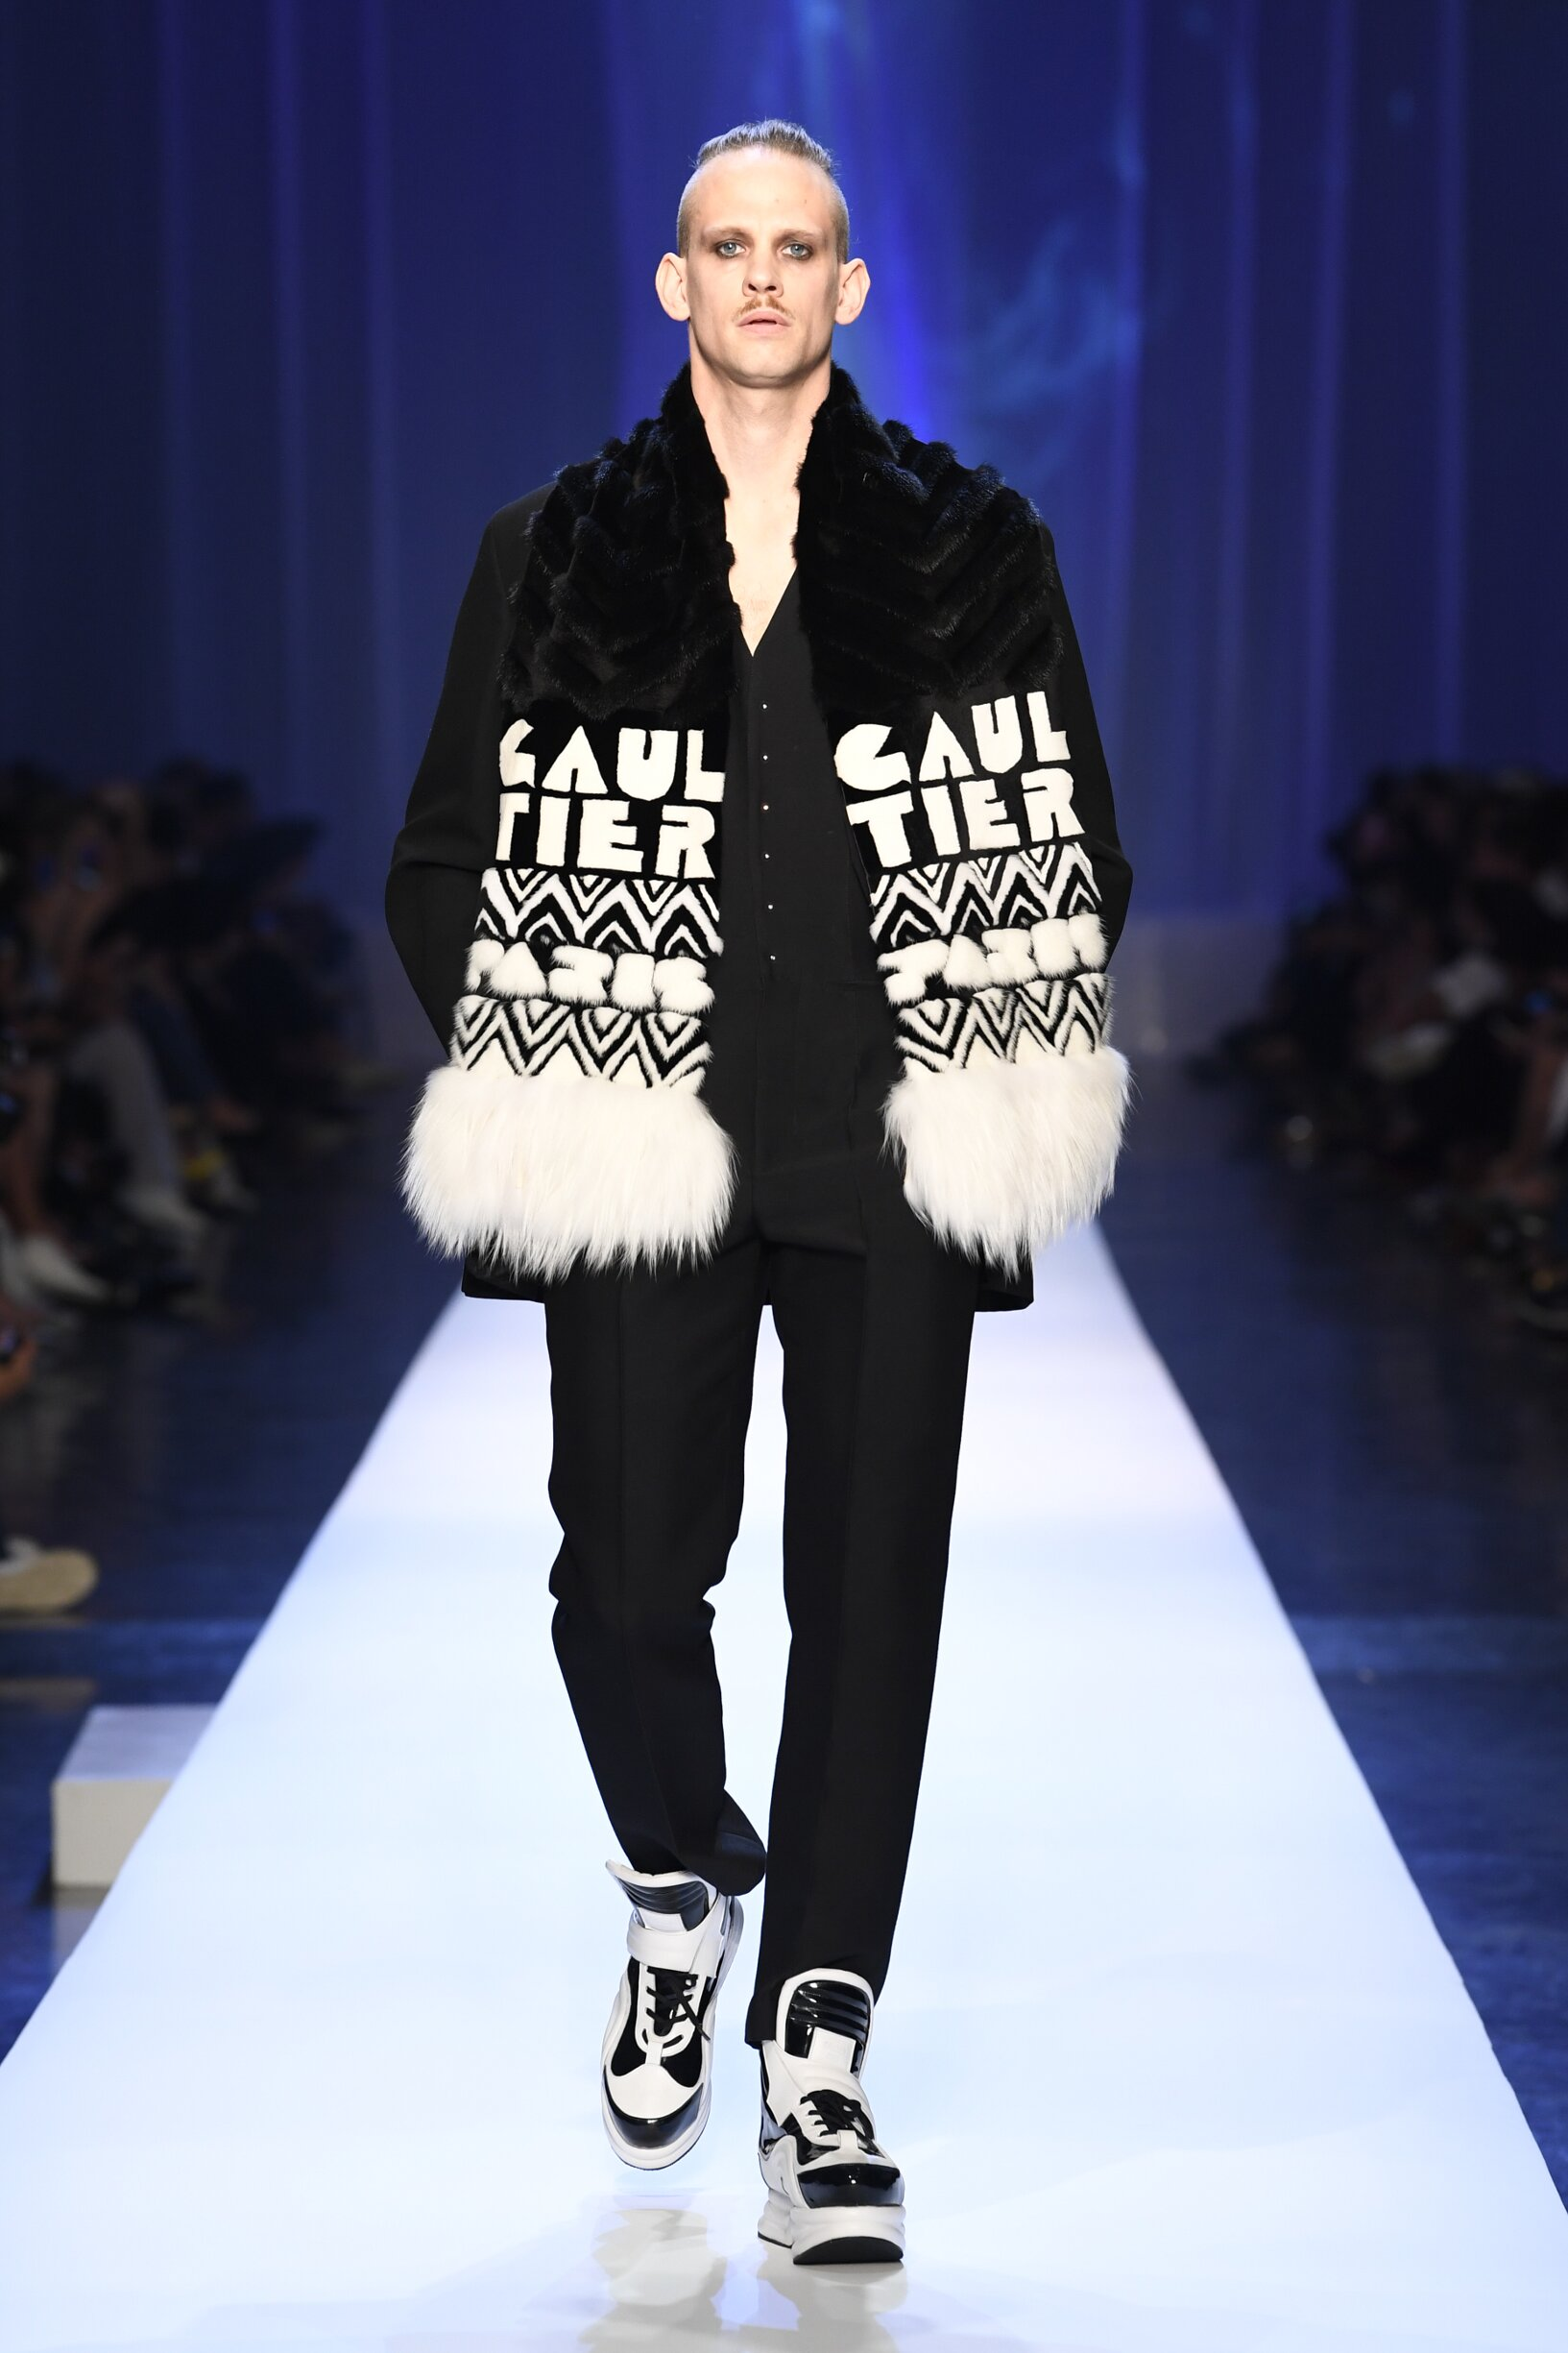 FW 2018 19 Jean-Paul Gaultier Haute Couture Fashion Show